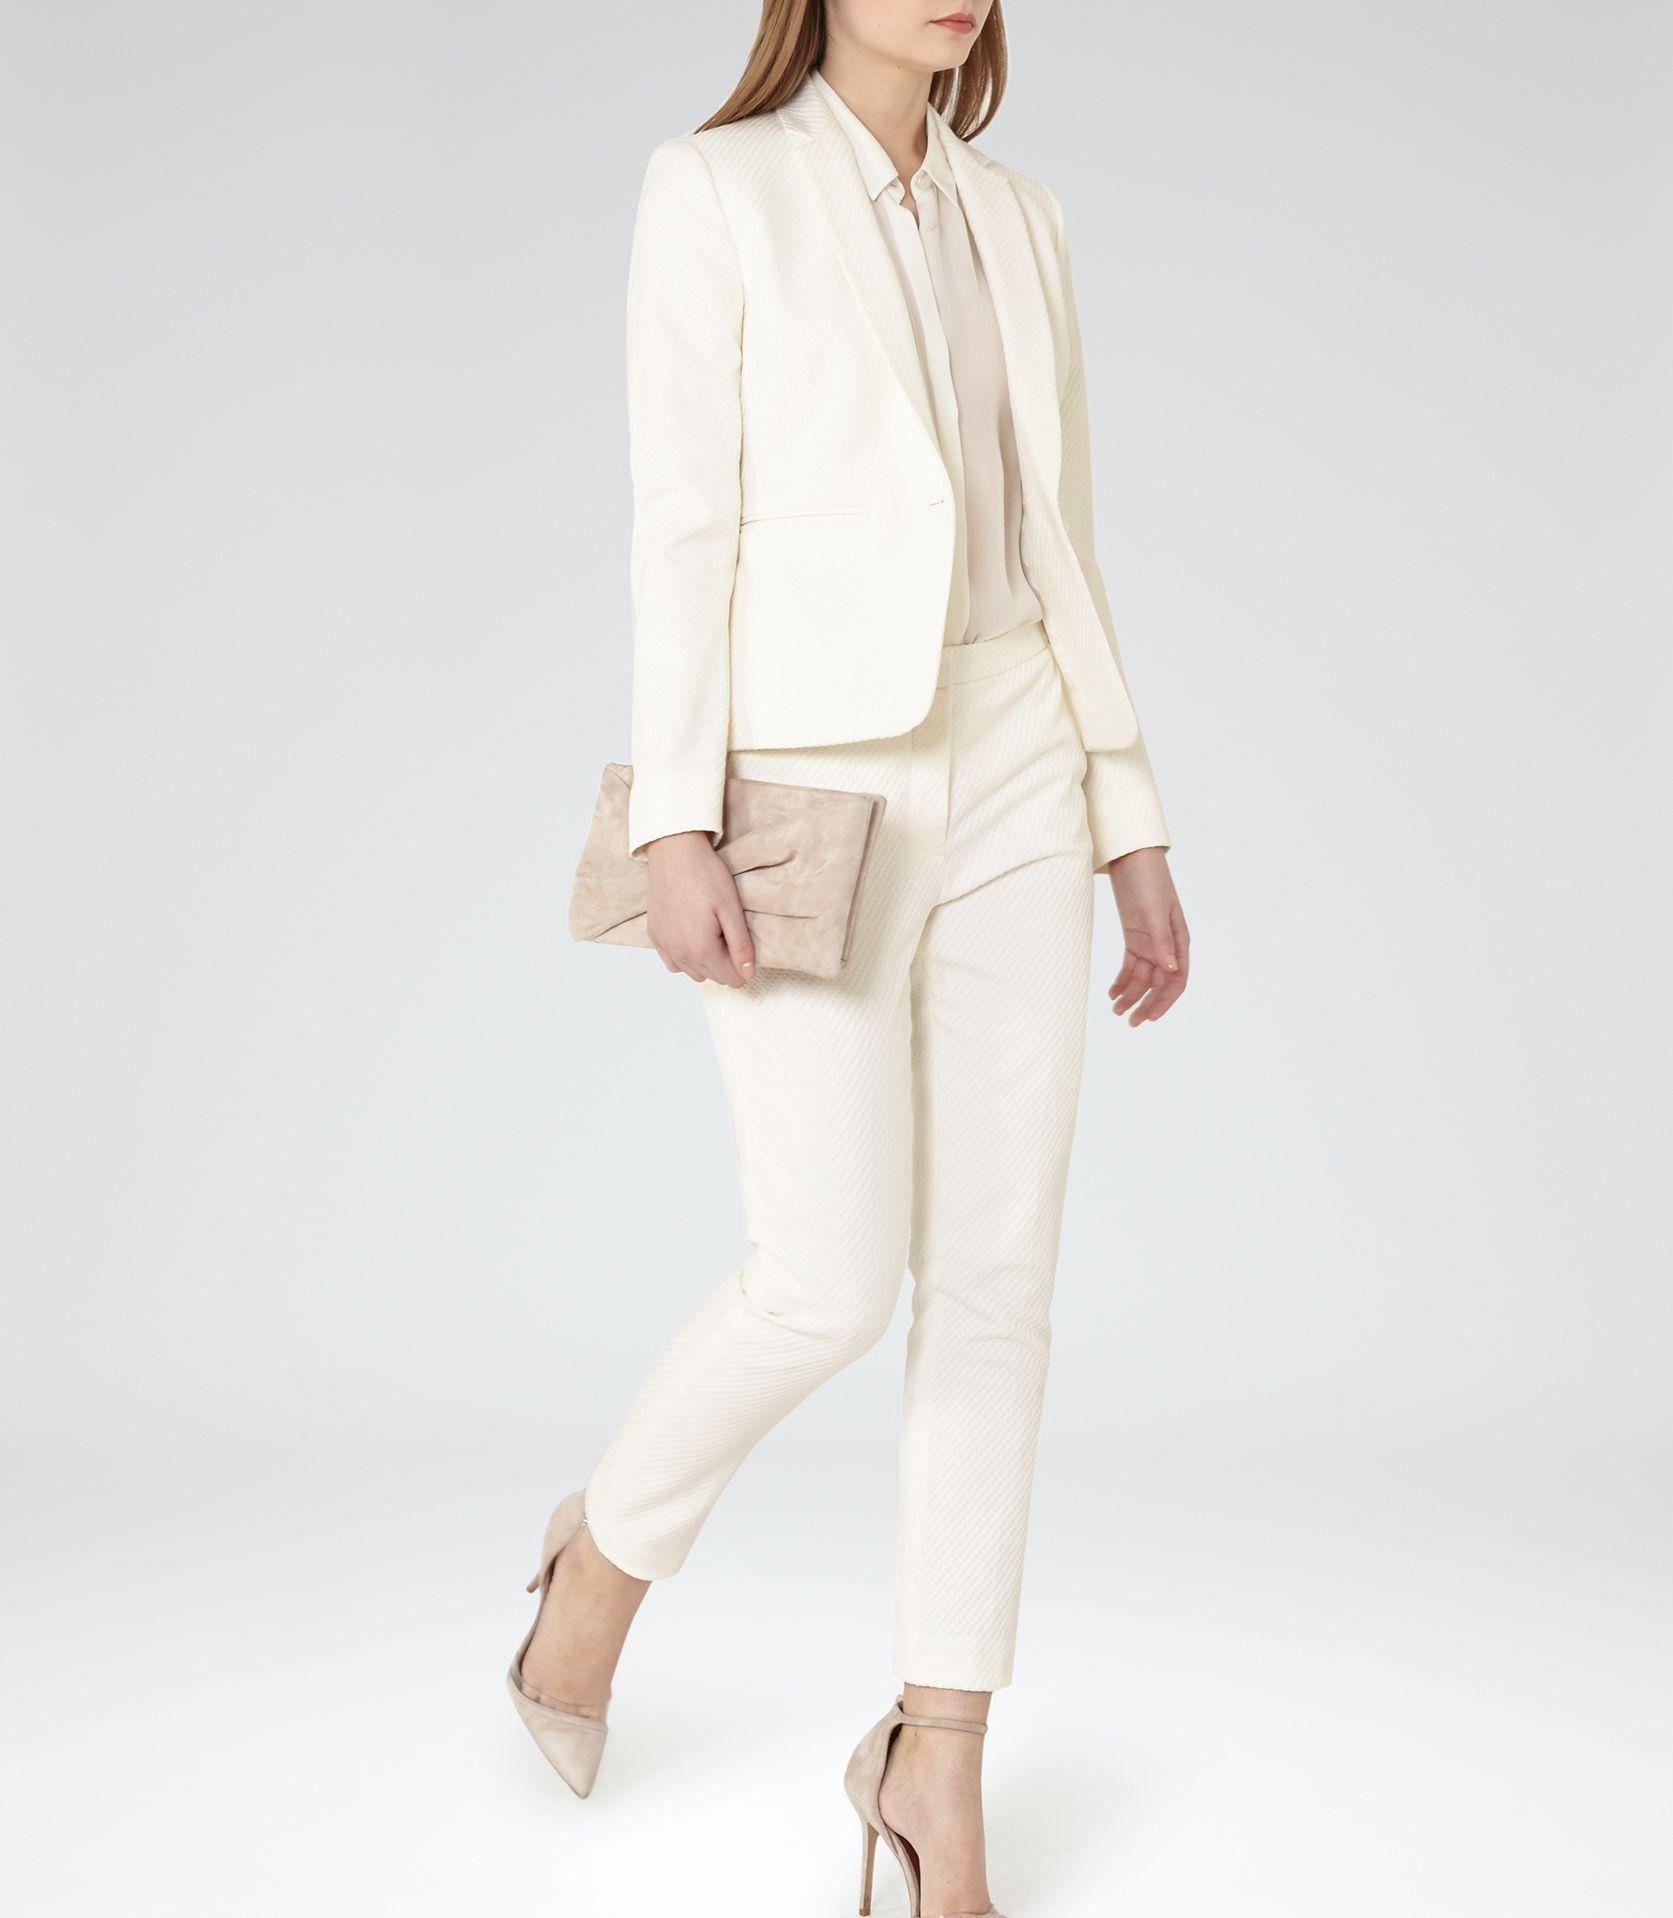 Ryder Black Wide Brim Hat - REISS | Blazers, White blazers and Ps